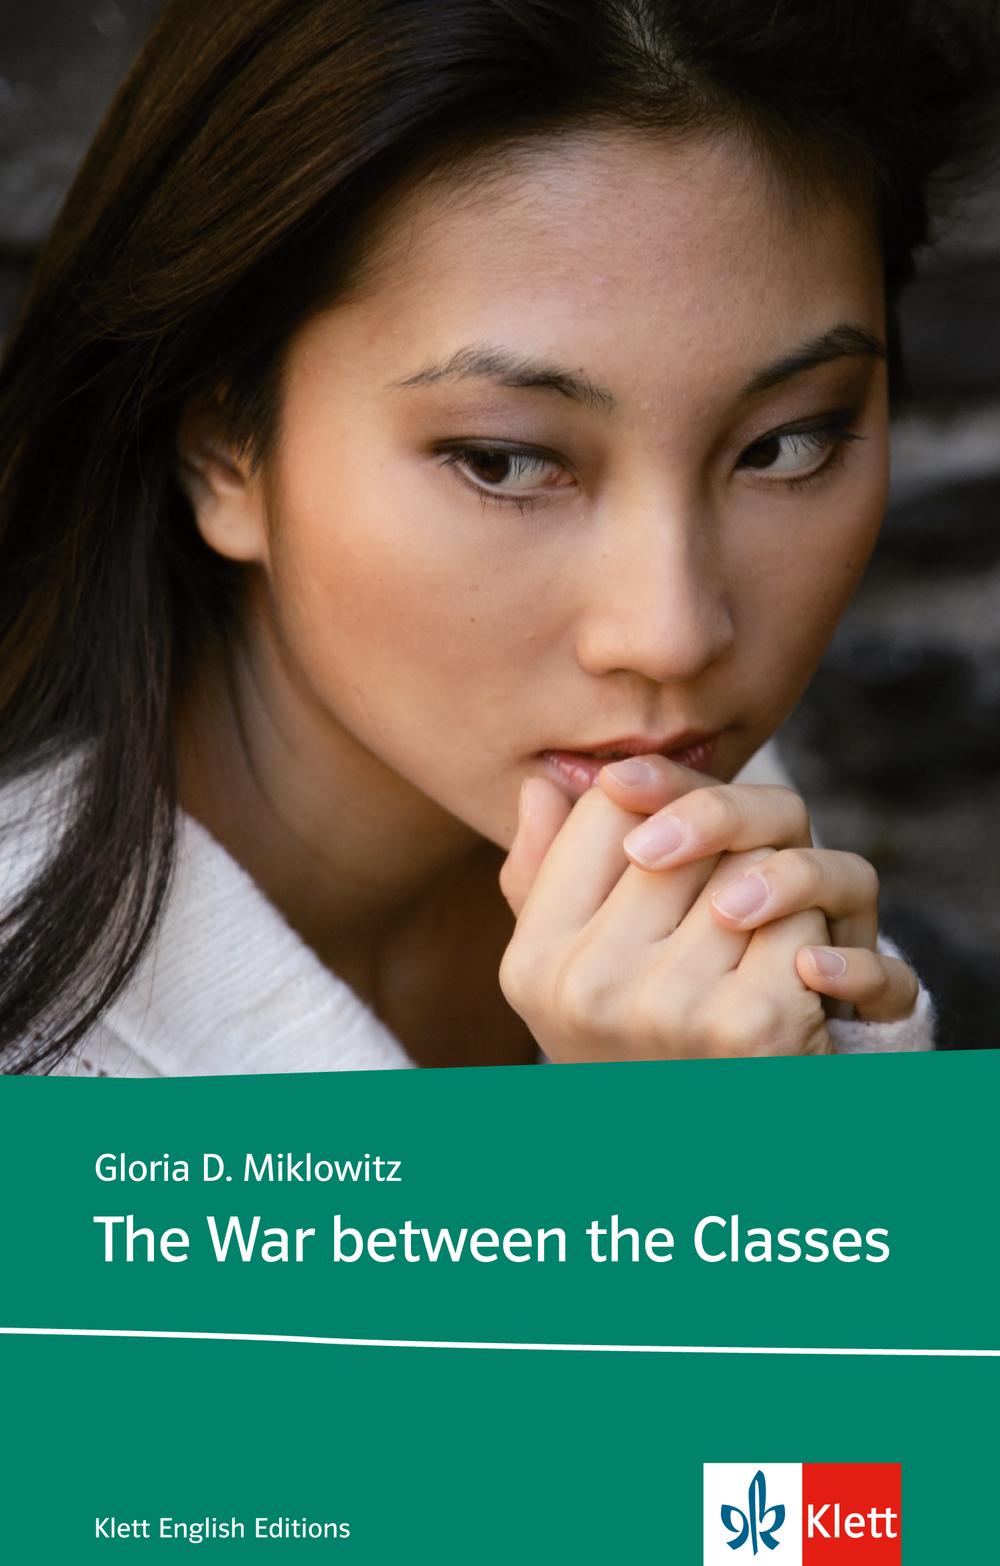 The War Between the Classes. Englischsprachige Ausgabe. - Gloria D. Miklowitz